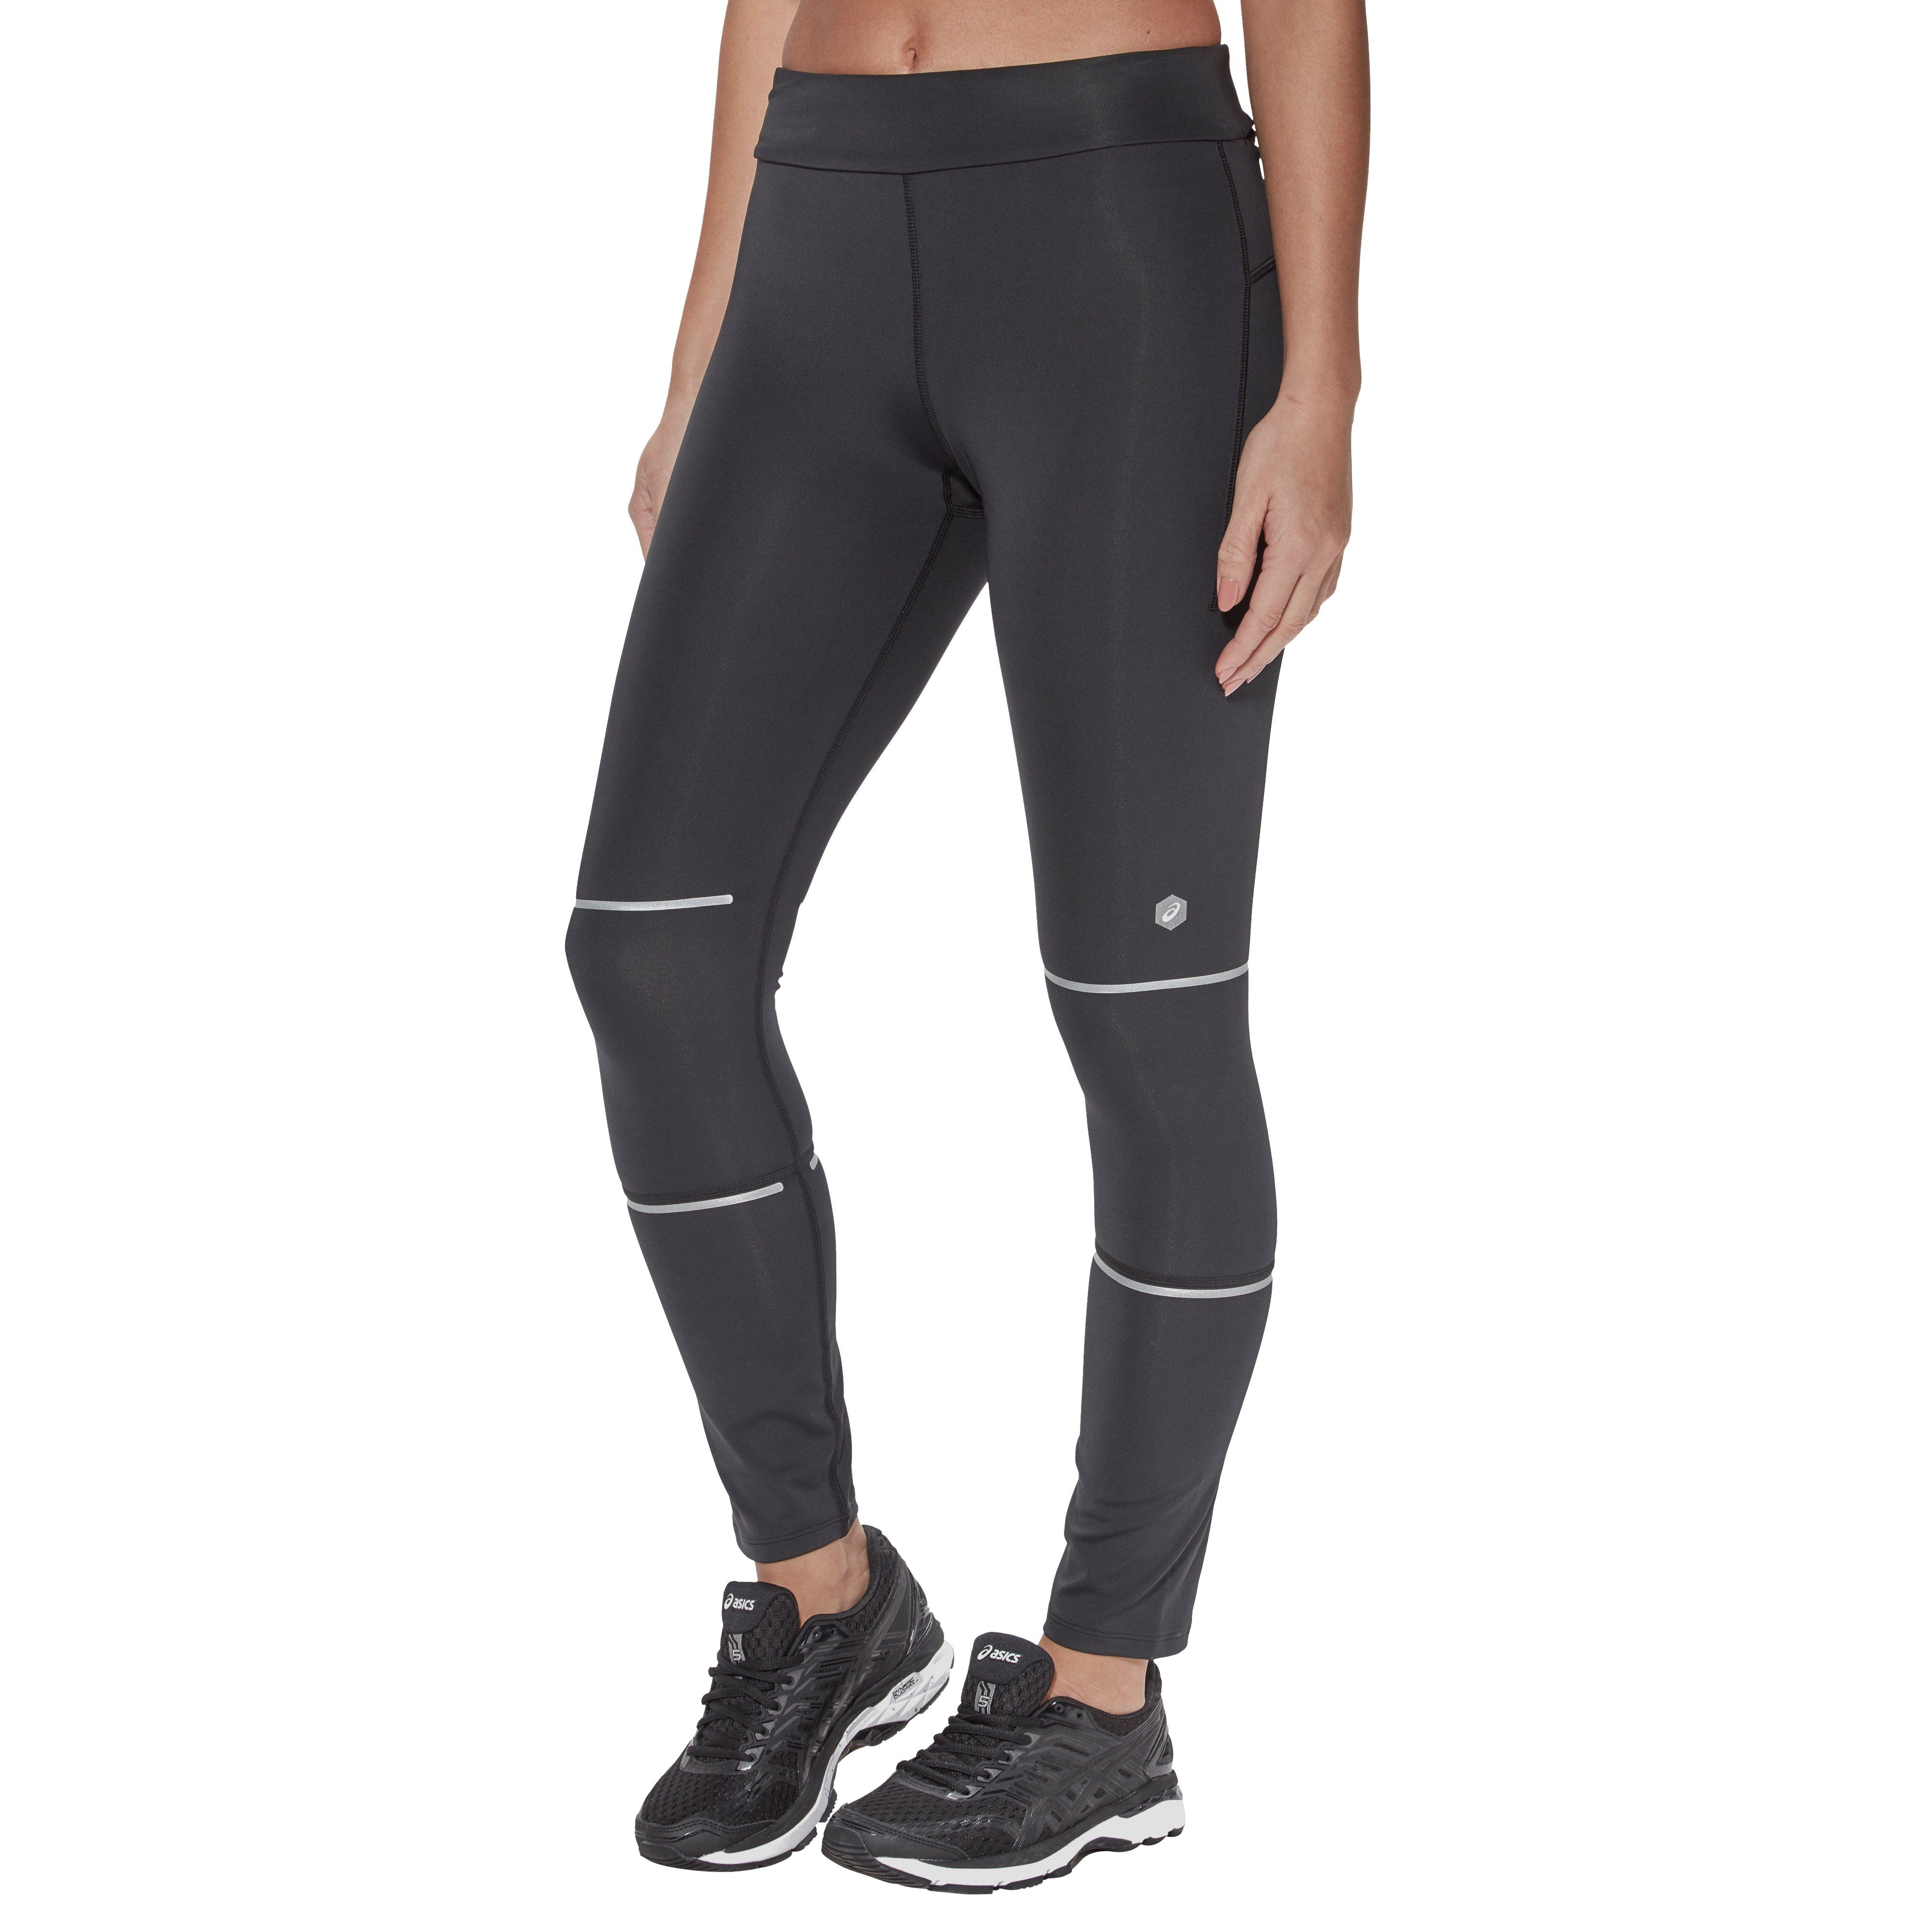 ASICS Lite-Show 7/8 Women's Running Tights